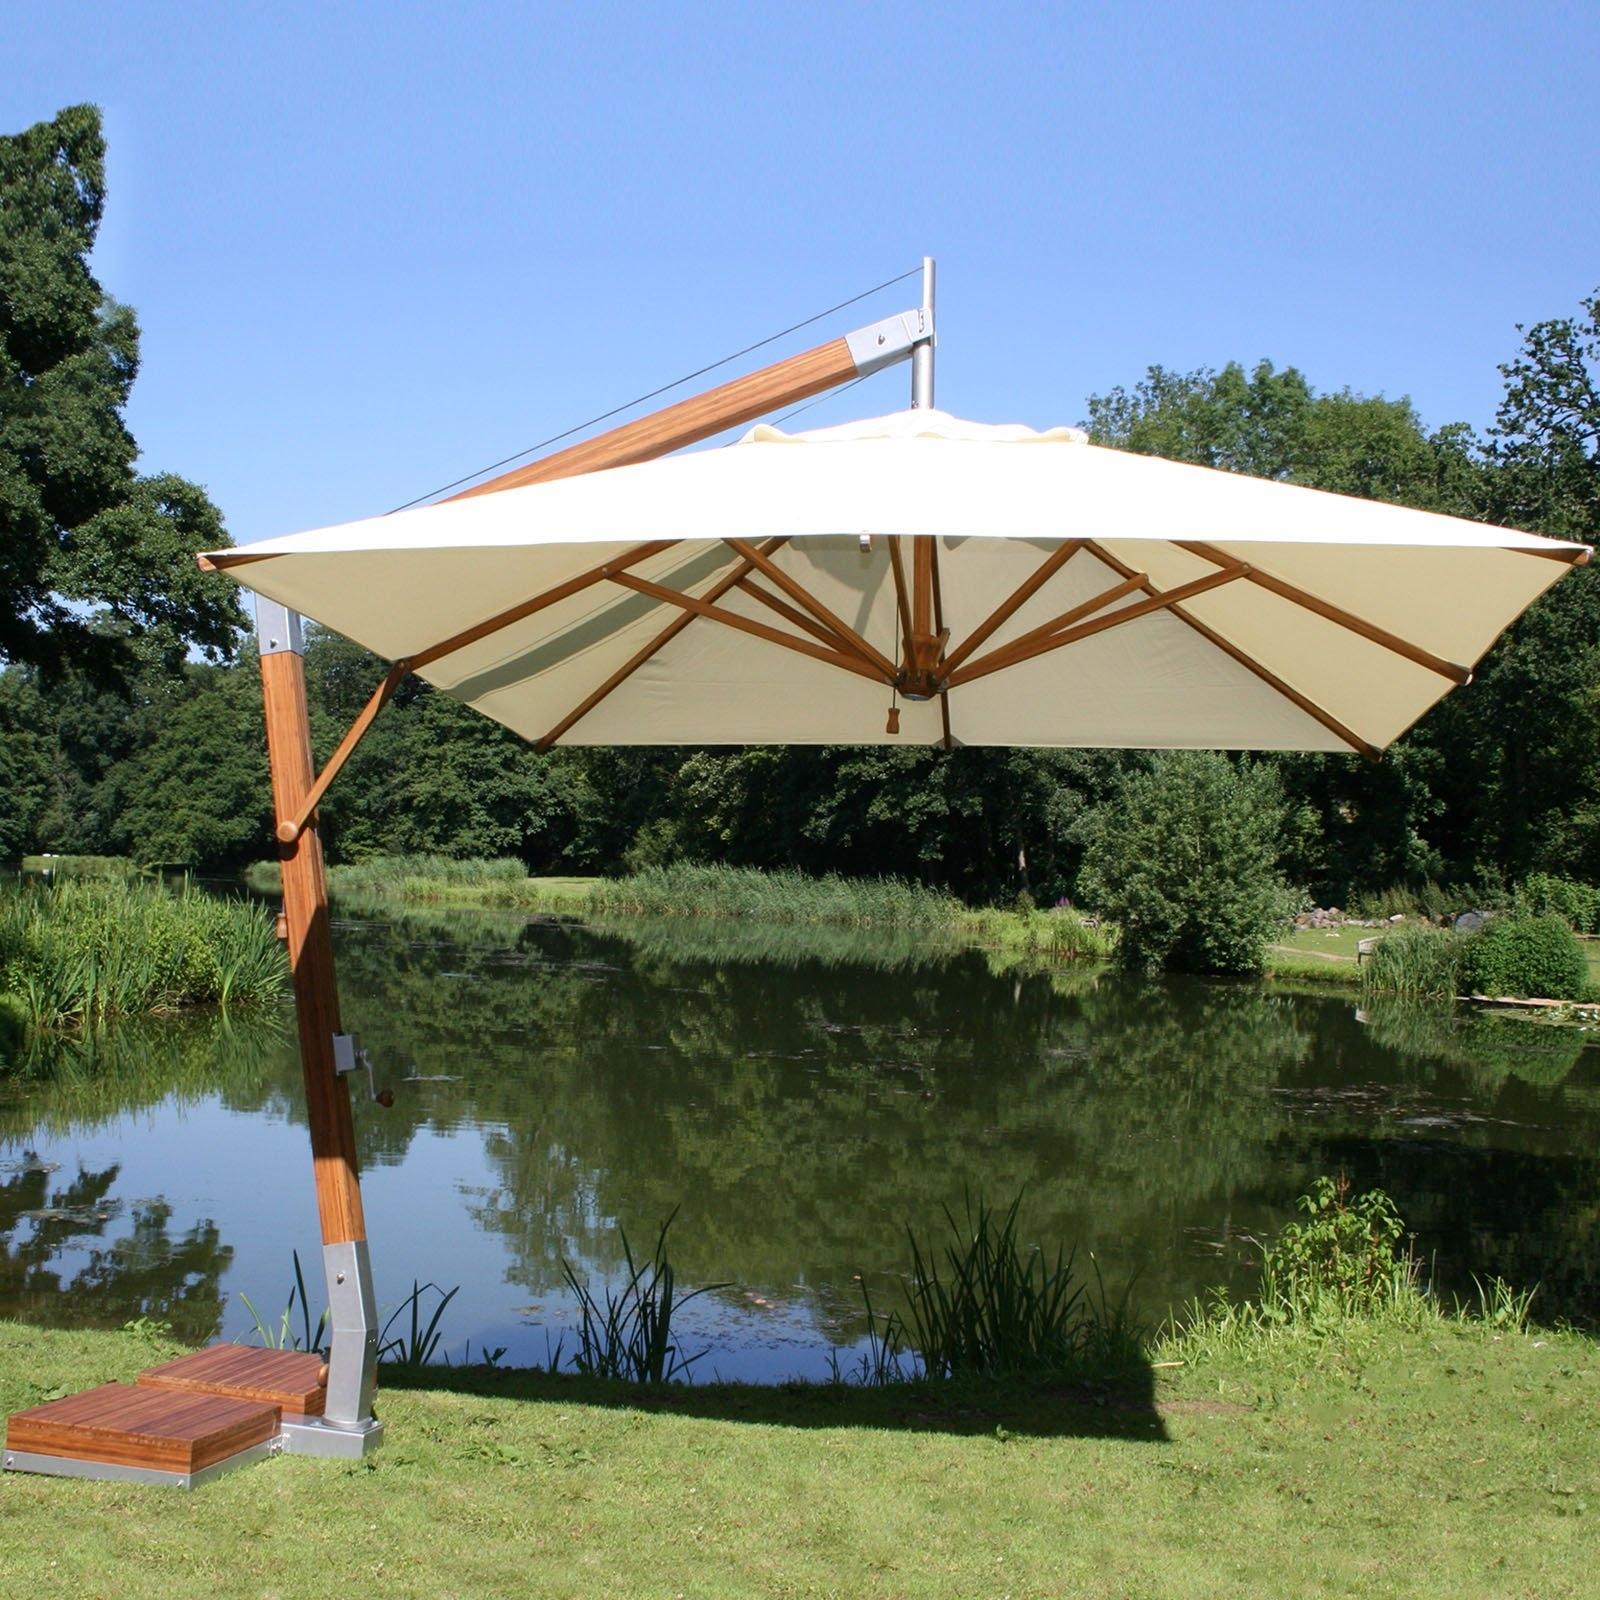 Fashionable Extra Large Patio Umbrellas Regarding Furniture: Offset Patio Umbrellas For Your Outdoor Ideas (View 12 of 20)